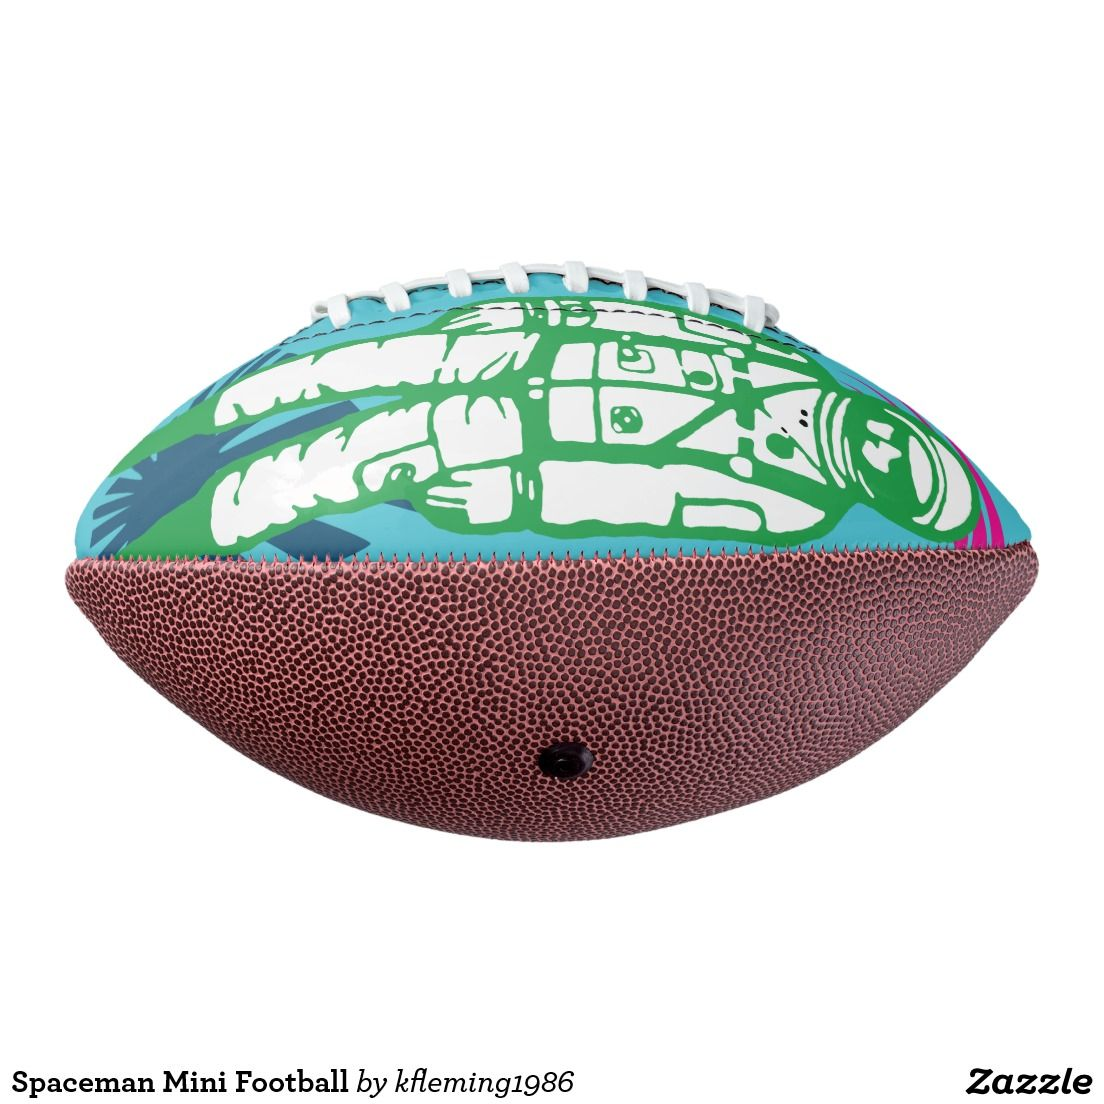 eed6c8e5a62 Spaceman Mini Football